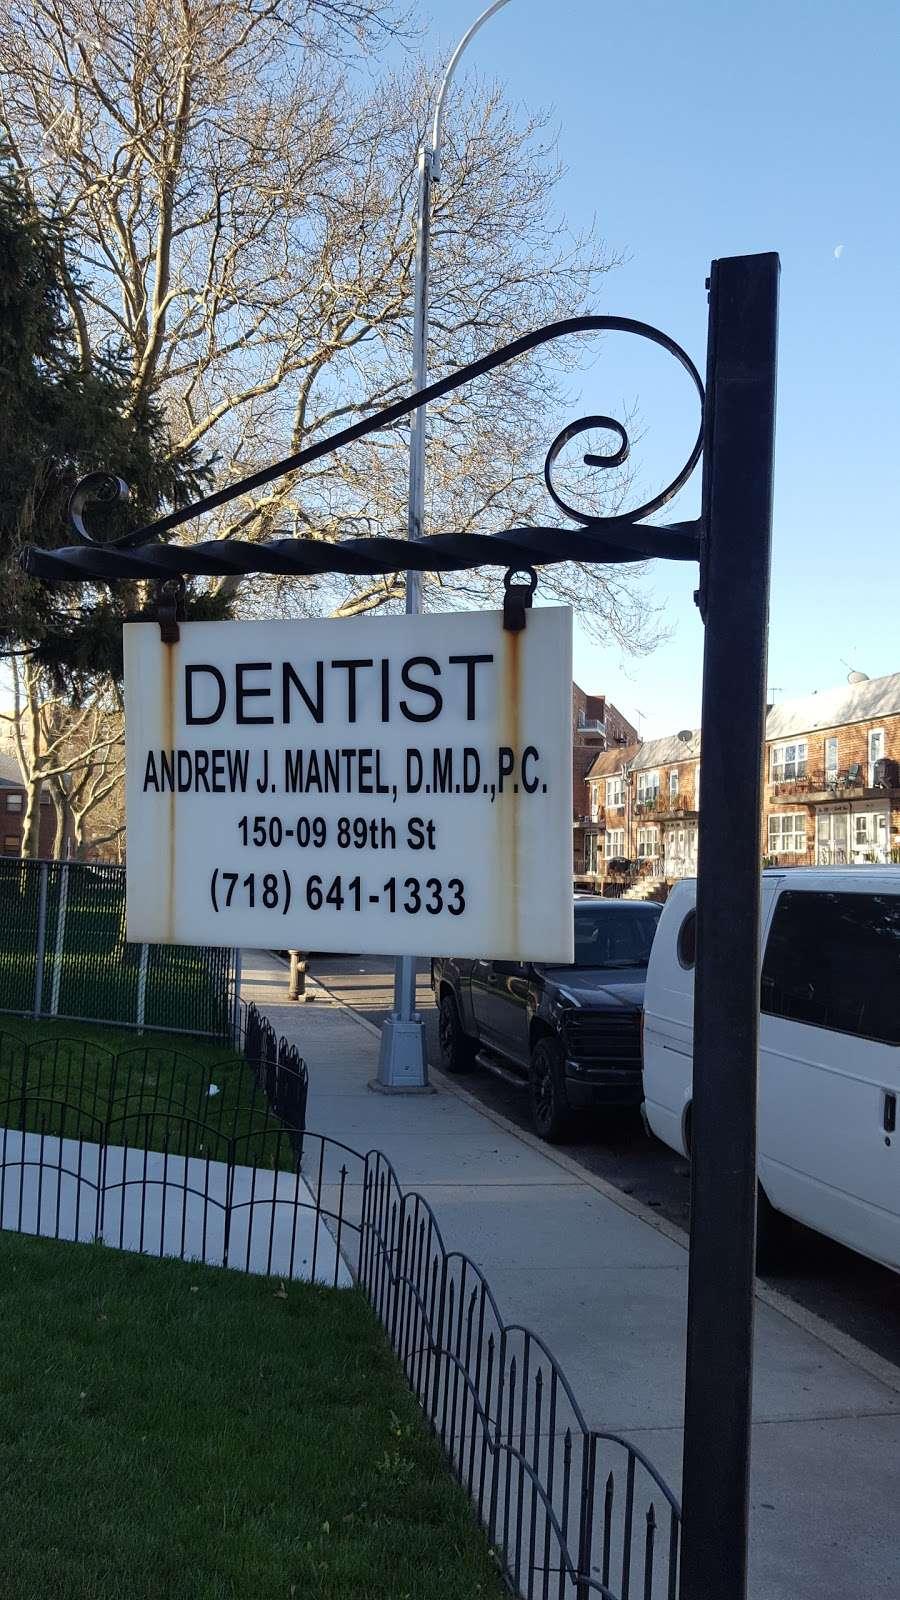 Mantel Andrew J DDS - dentist  | Photo 3 of 3 | Address: 150-9 89th St, Howard Beach, NY 11414, USA | Phone: (718) 641-1333